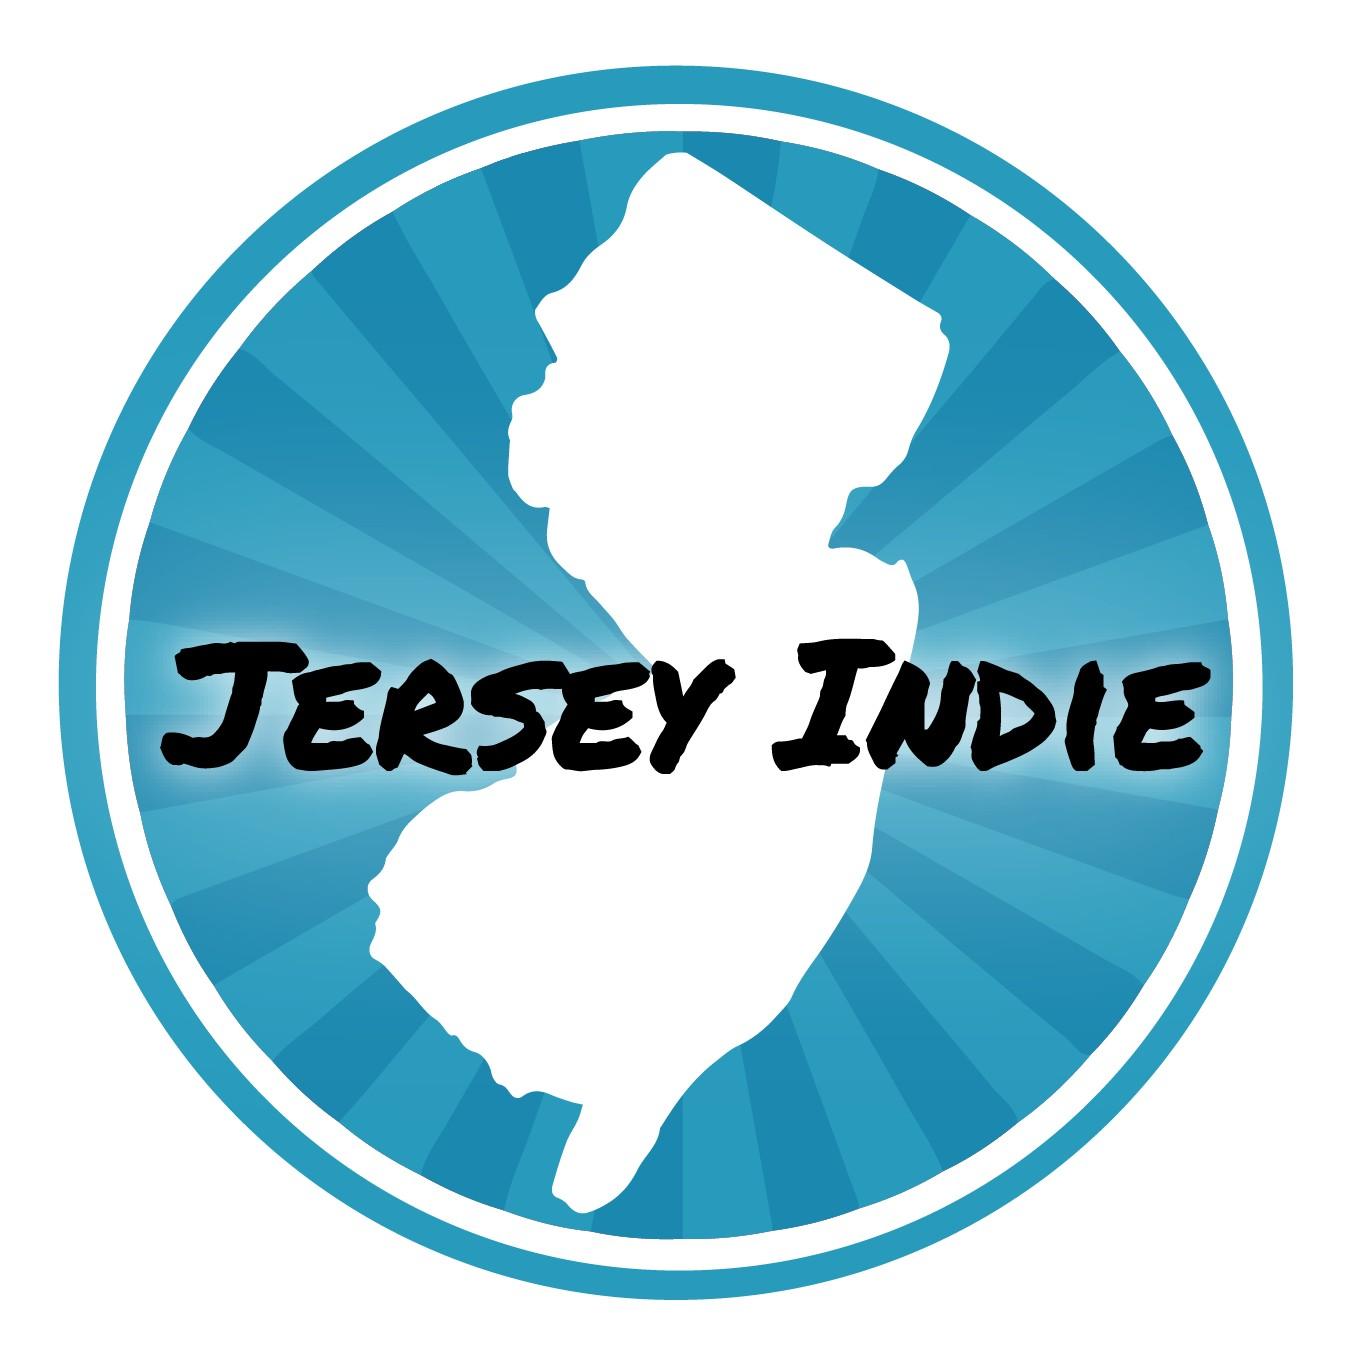 Jersey Indie | LinkedIn